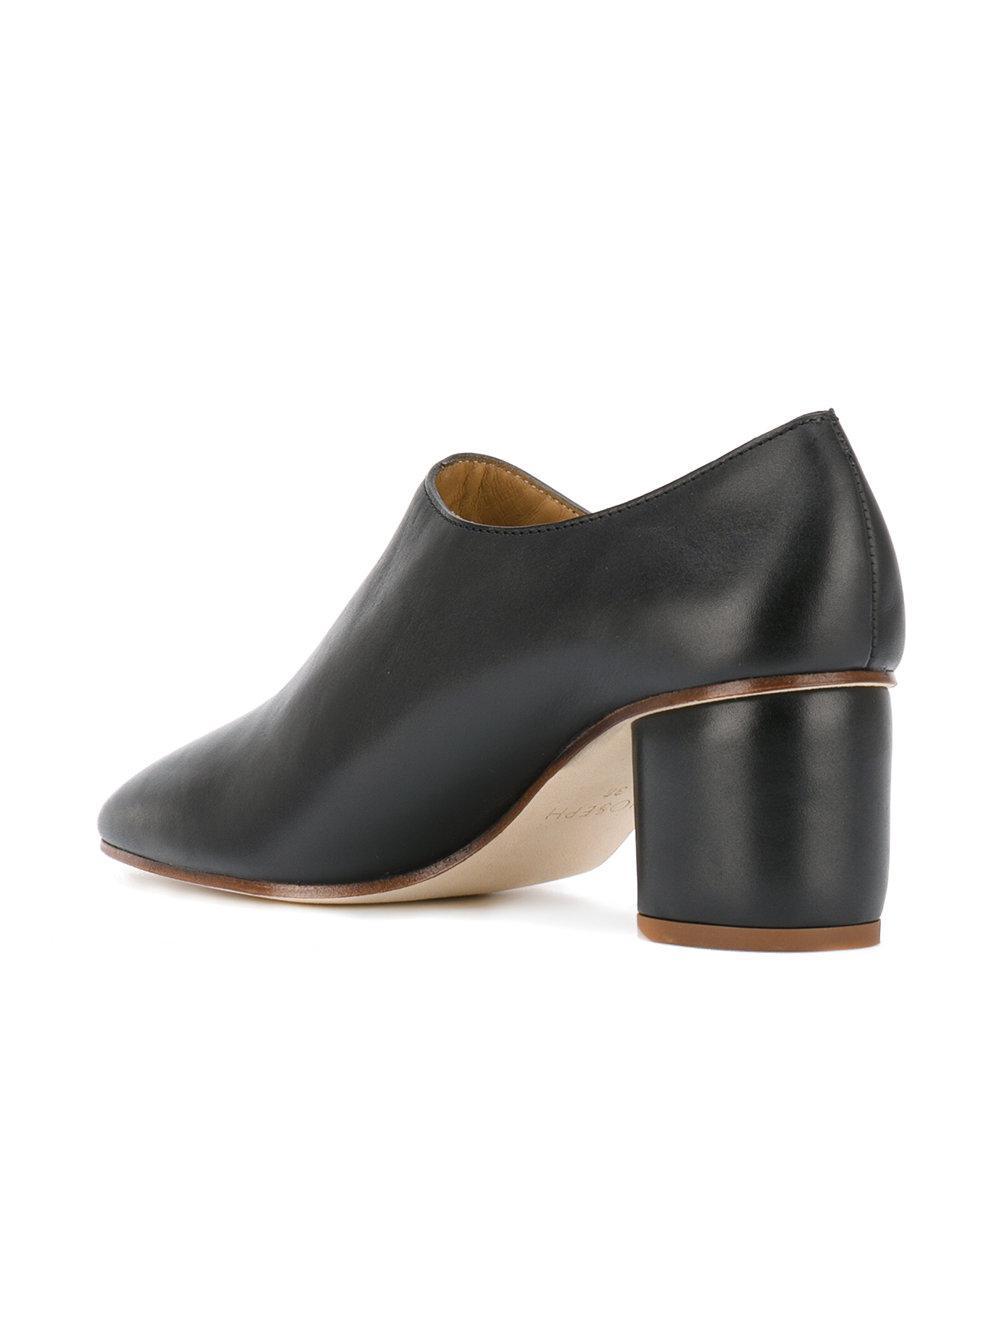 mid heel pumps - Black Joseph ouevkzLi